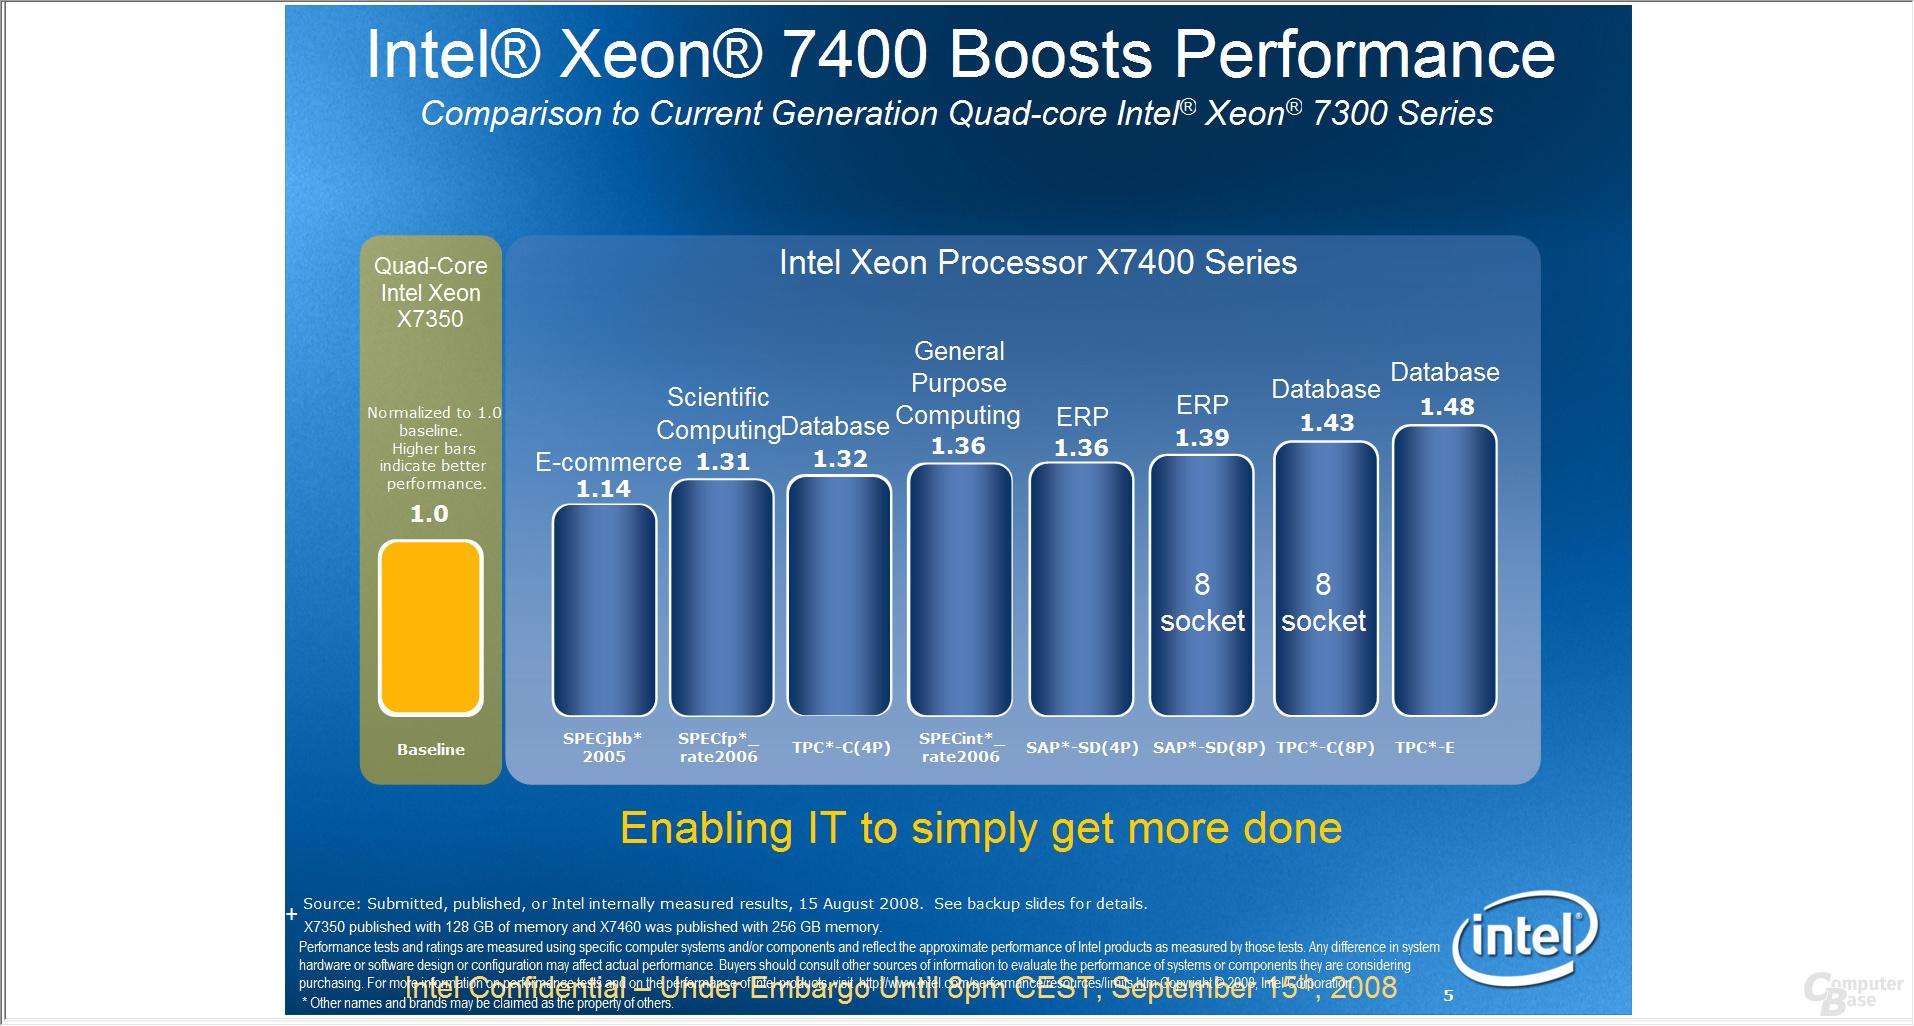 Intel Xeon 7400 Series